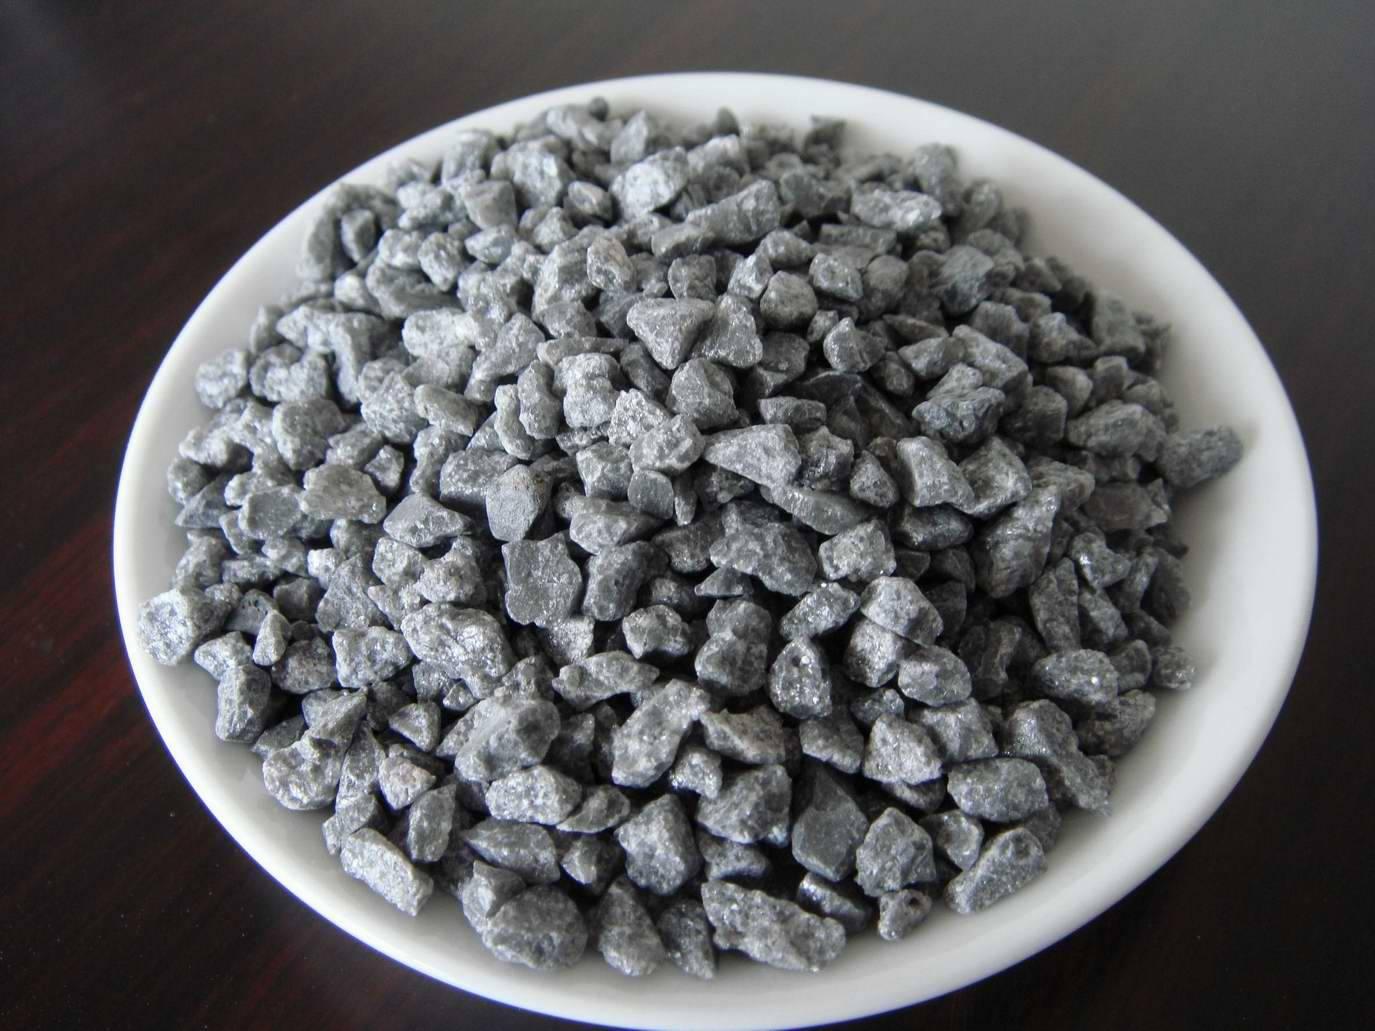 Brown fused alumina, Brown aluminium oxide abrasive